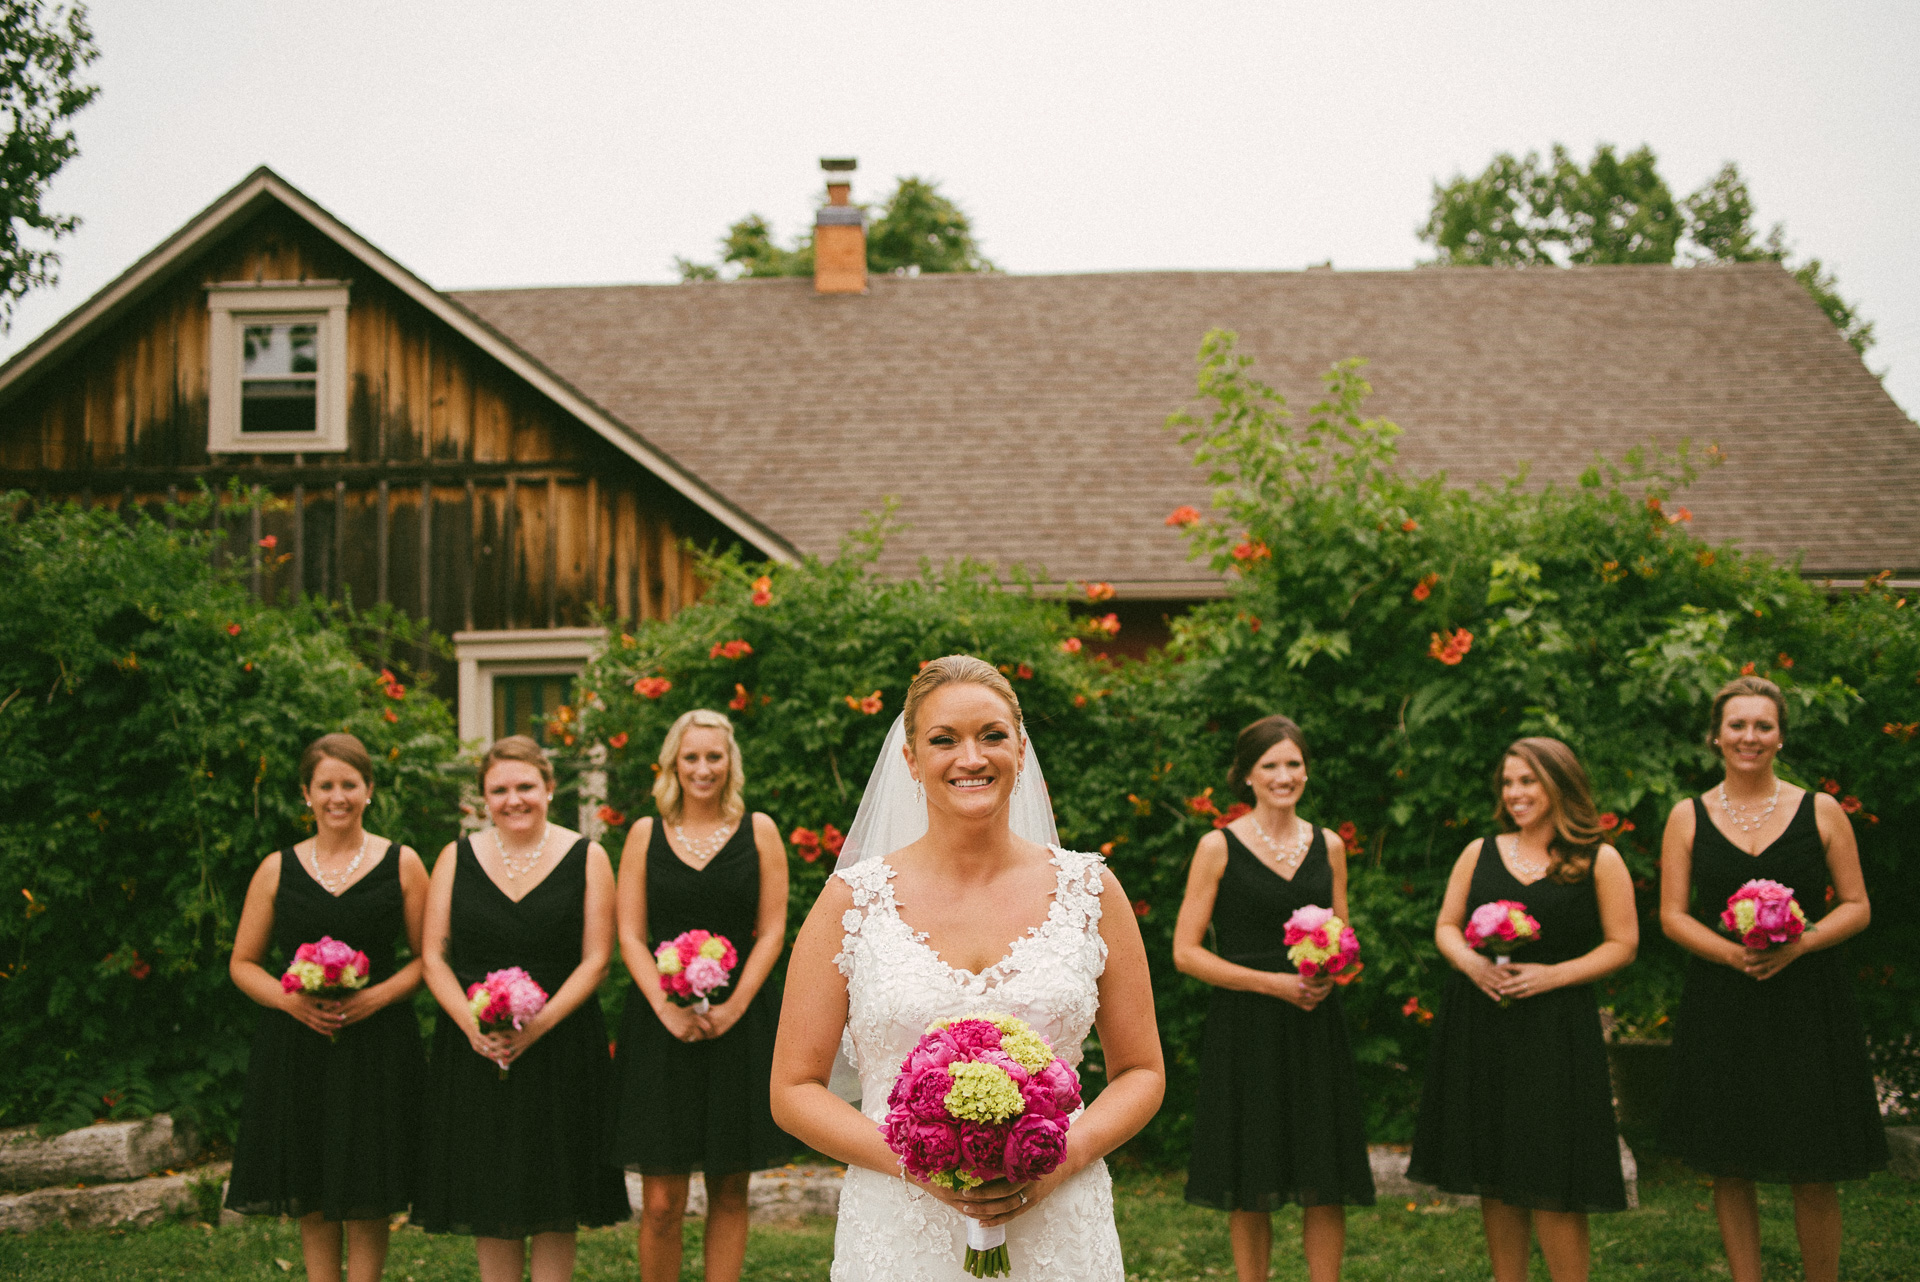 Dayton Wedding Photographer - The bride and bridesmaids